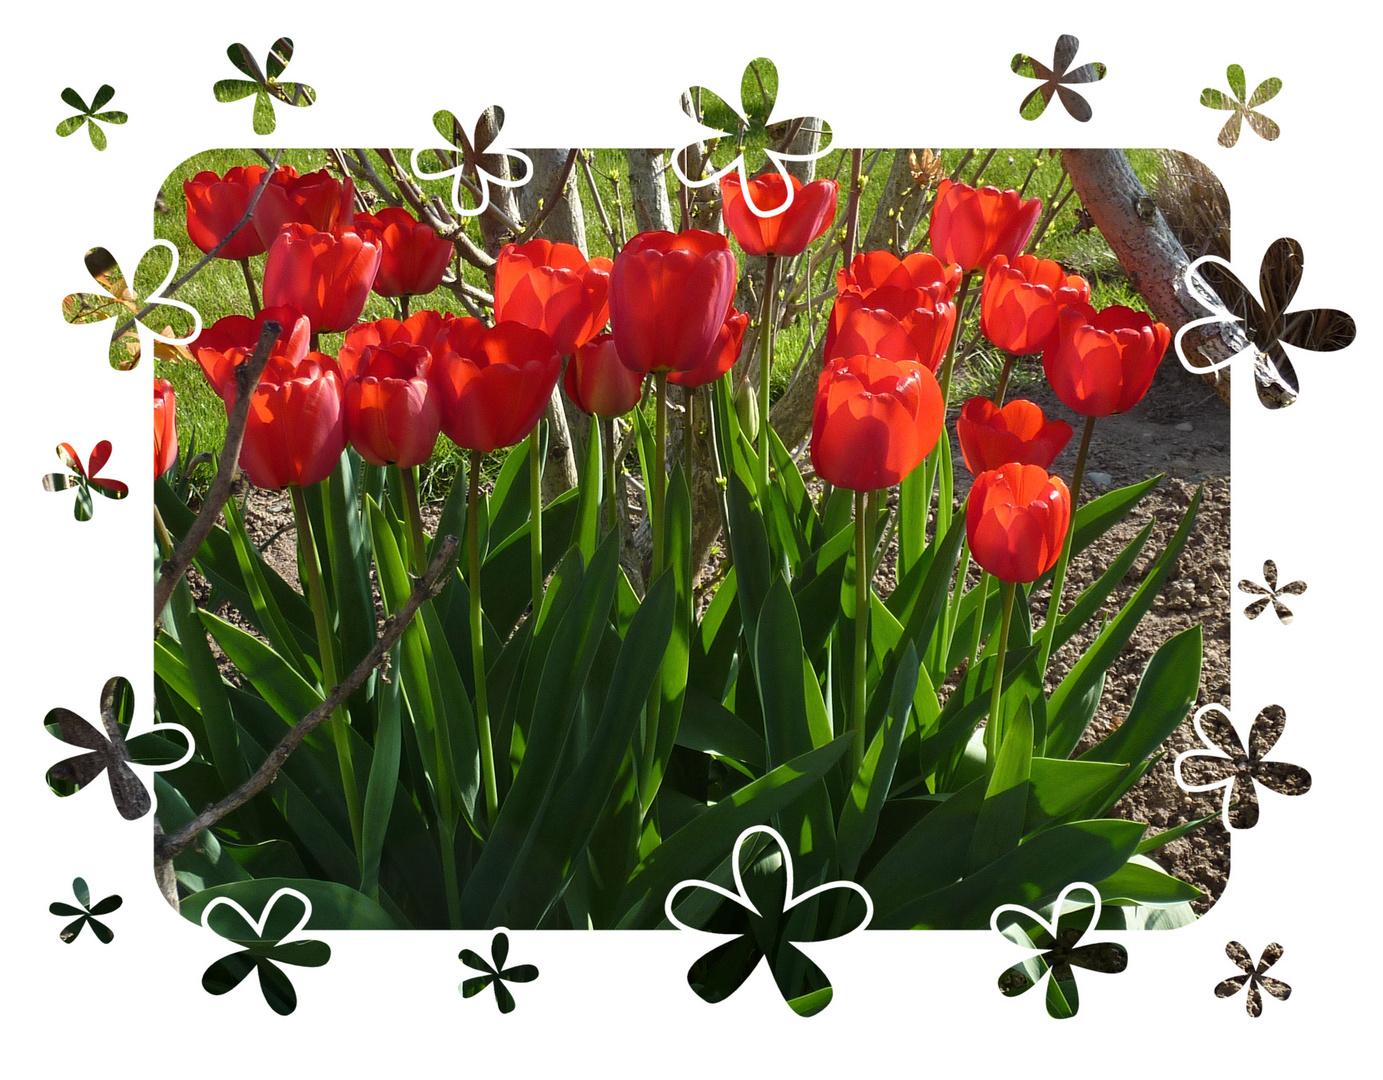 le festival des tulipes!